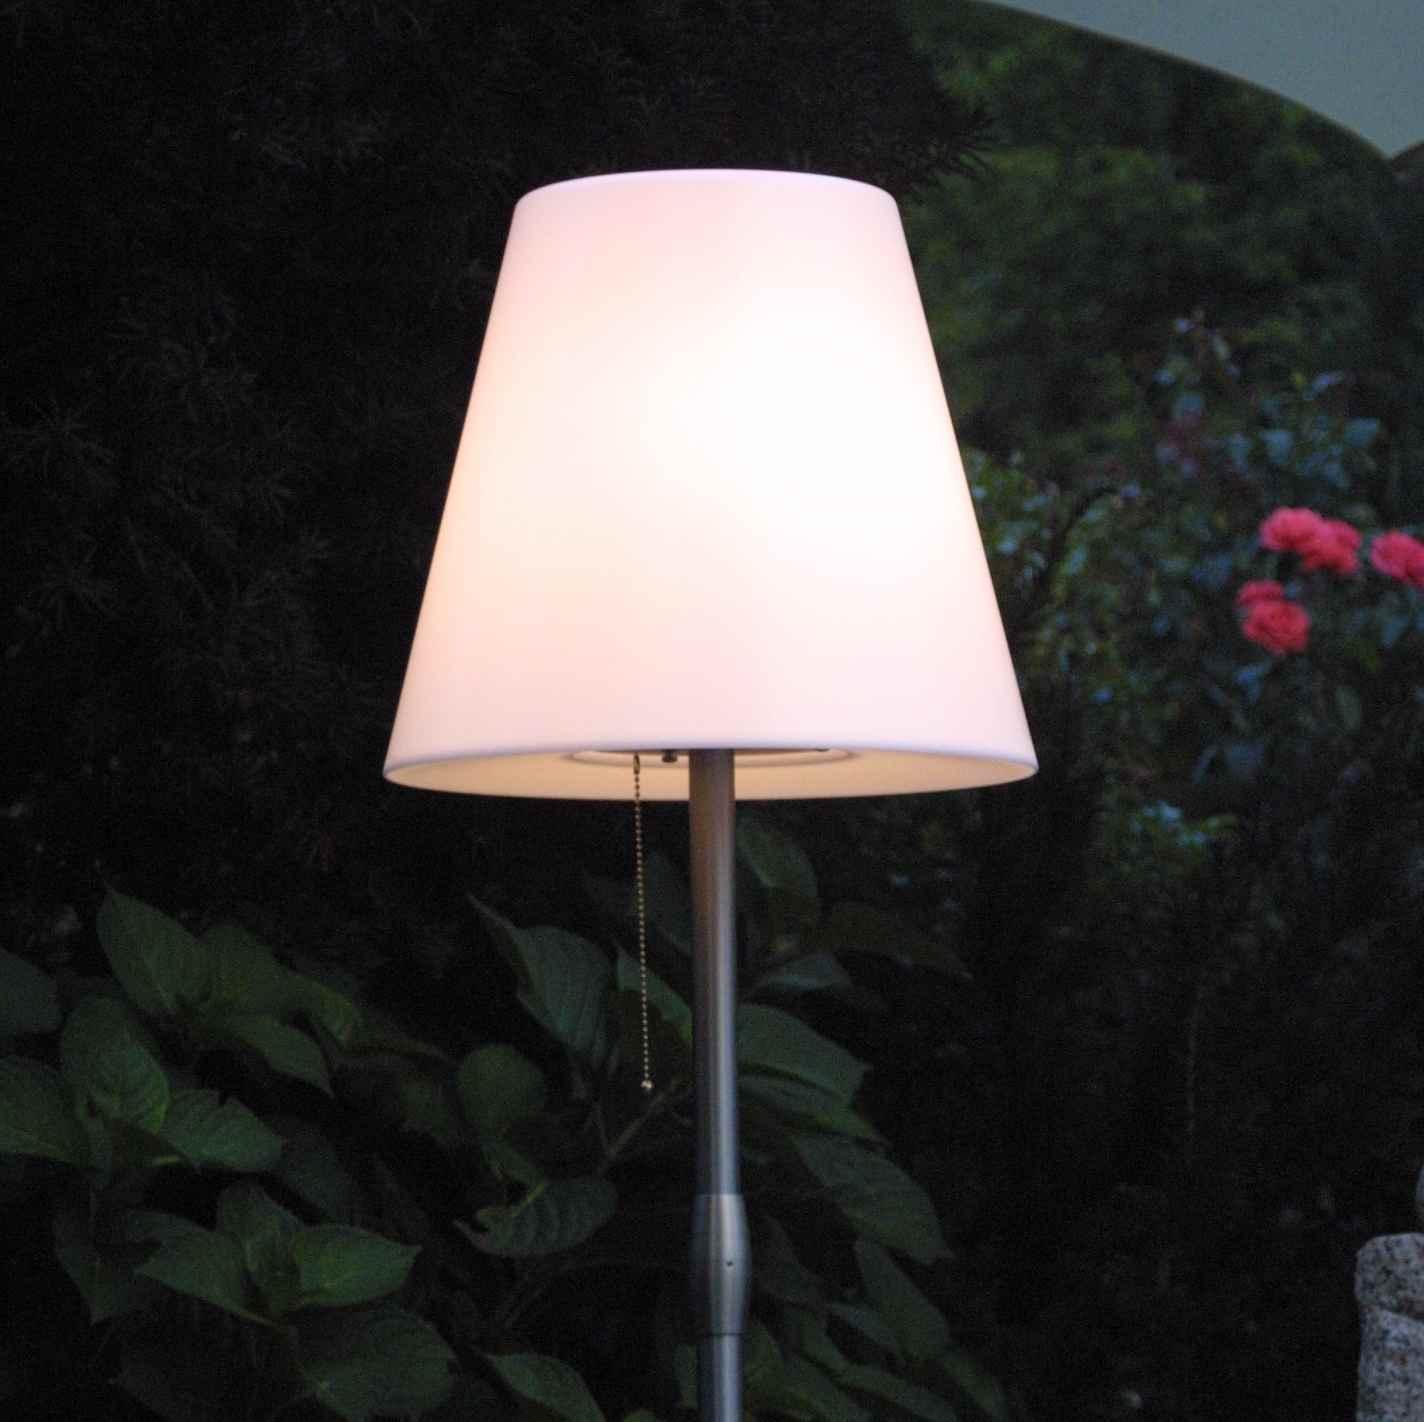 Stehlampen Aussen Stilvoll Den Aussenbereich Beleuchten